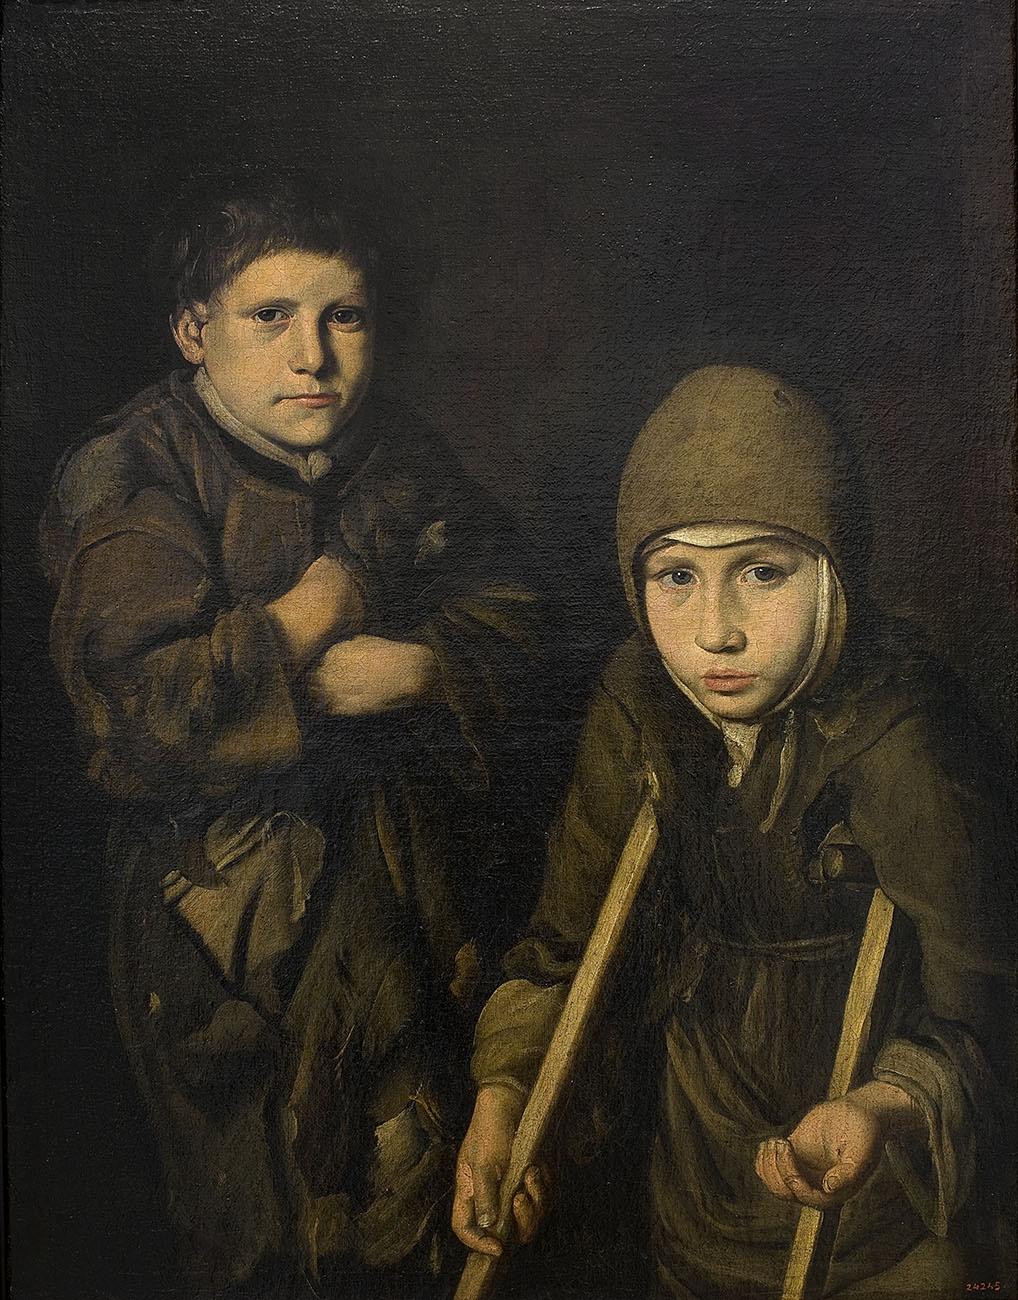 Niños mendigos